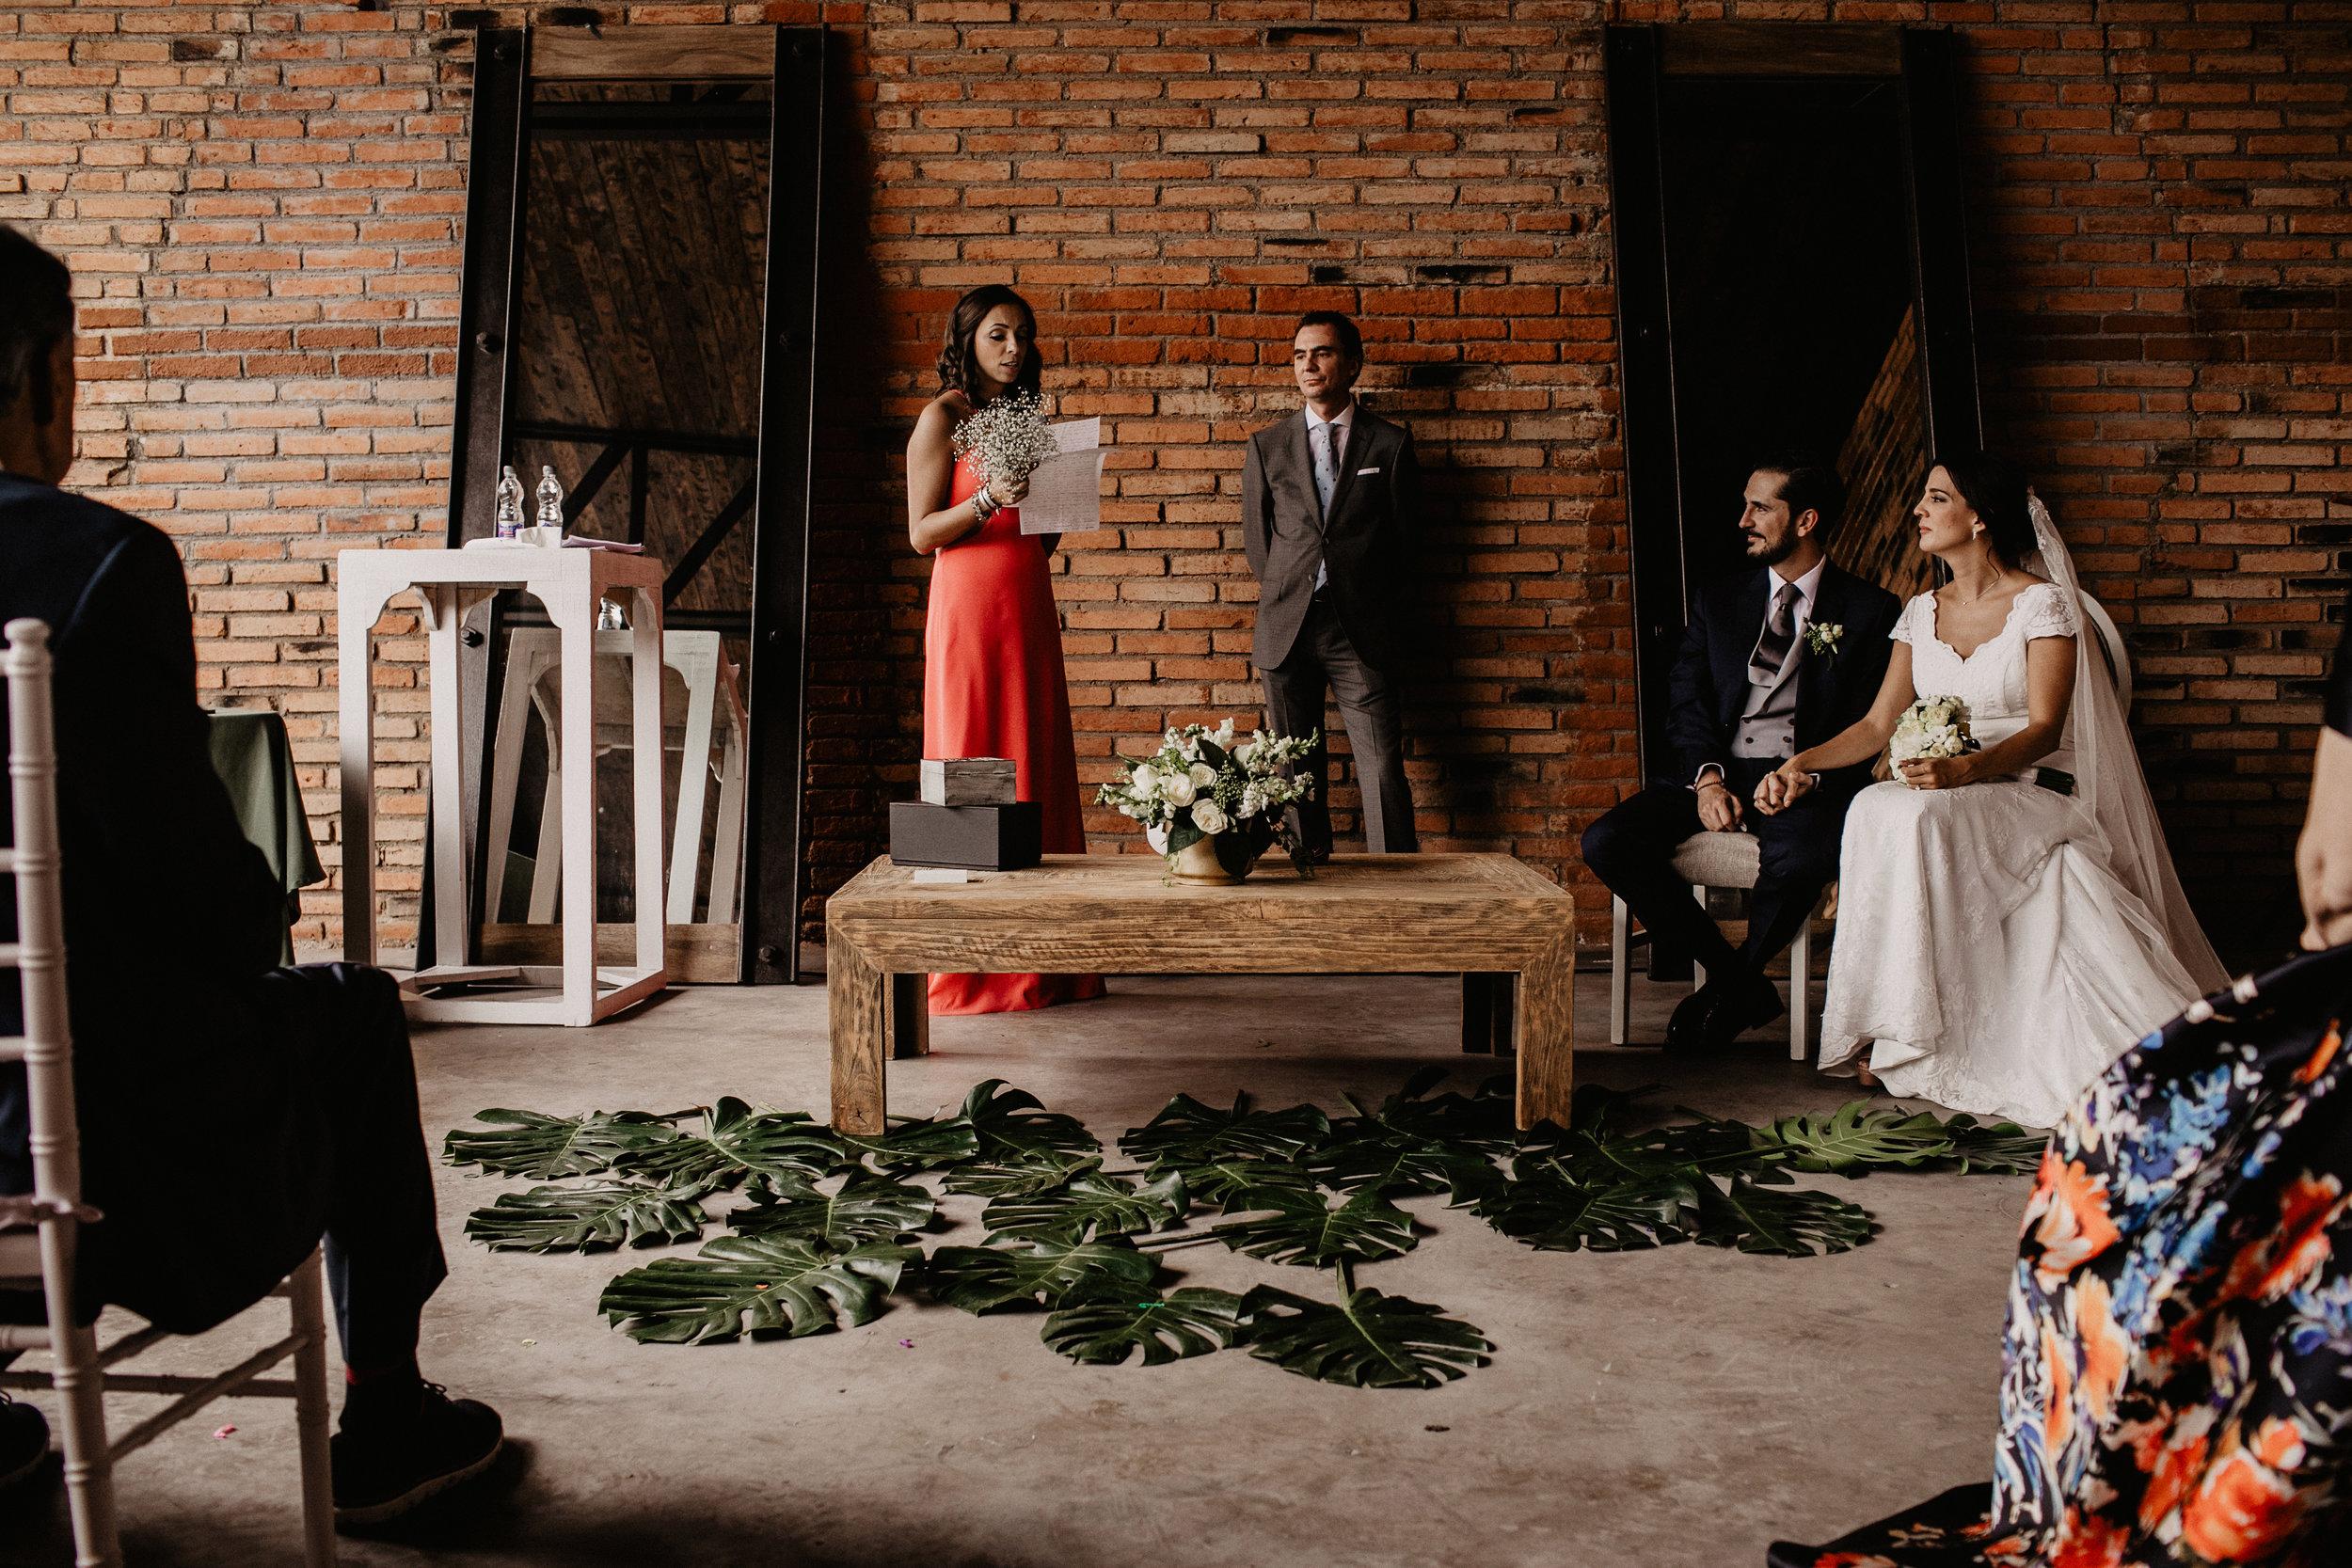 alfonso_flores_destination_wedding_photographer_pau_alonso_441.JPG